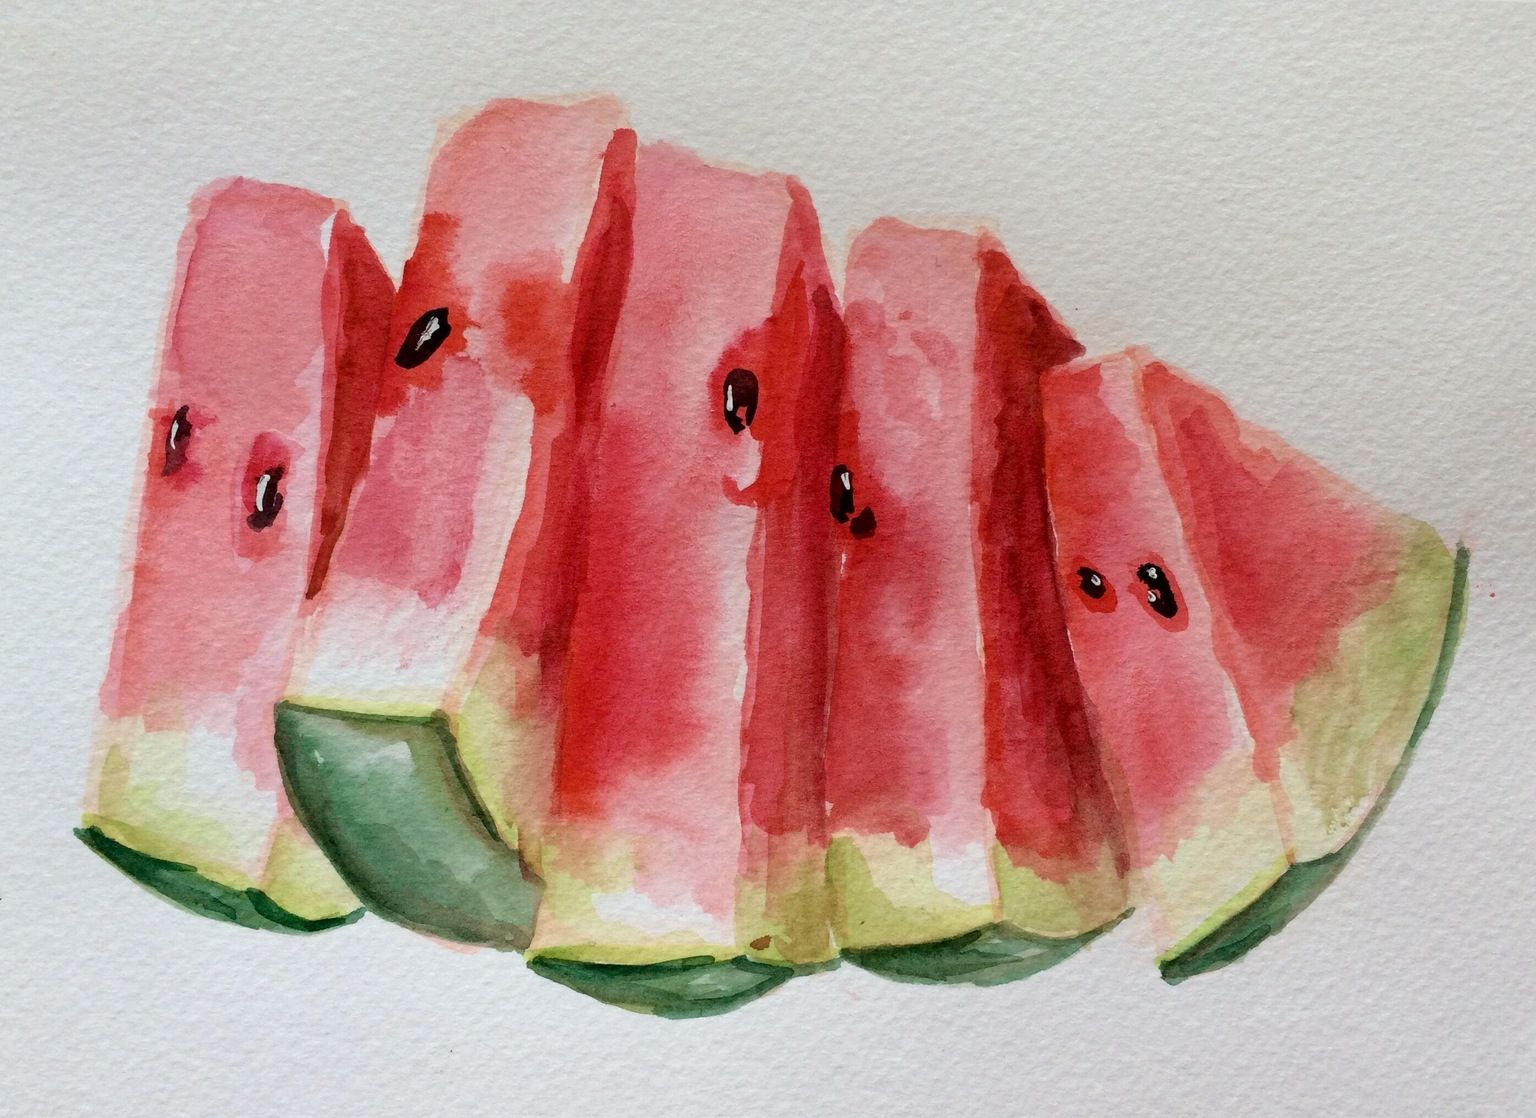 Watercolor Watermelon 수채화 삽화 과일 예술 수채화 아이디어